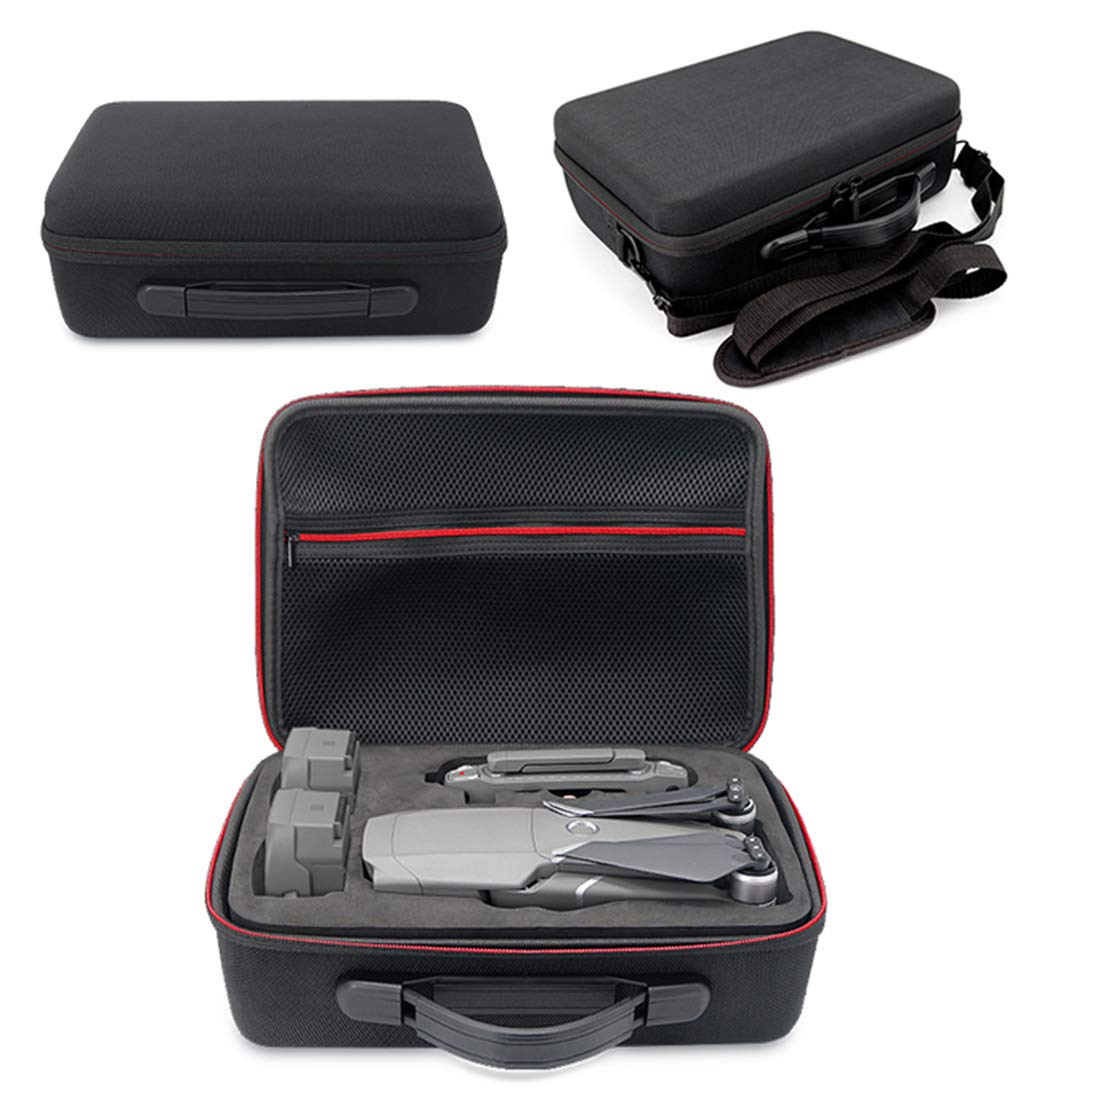 YAKOK General Waterproof Single Shoulder Bag 3 Batteries Safety Case Box Drone Accessories for DJI Mavic 2 PRO/Mavic 2 Zoom (Black)